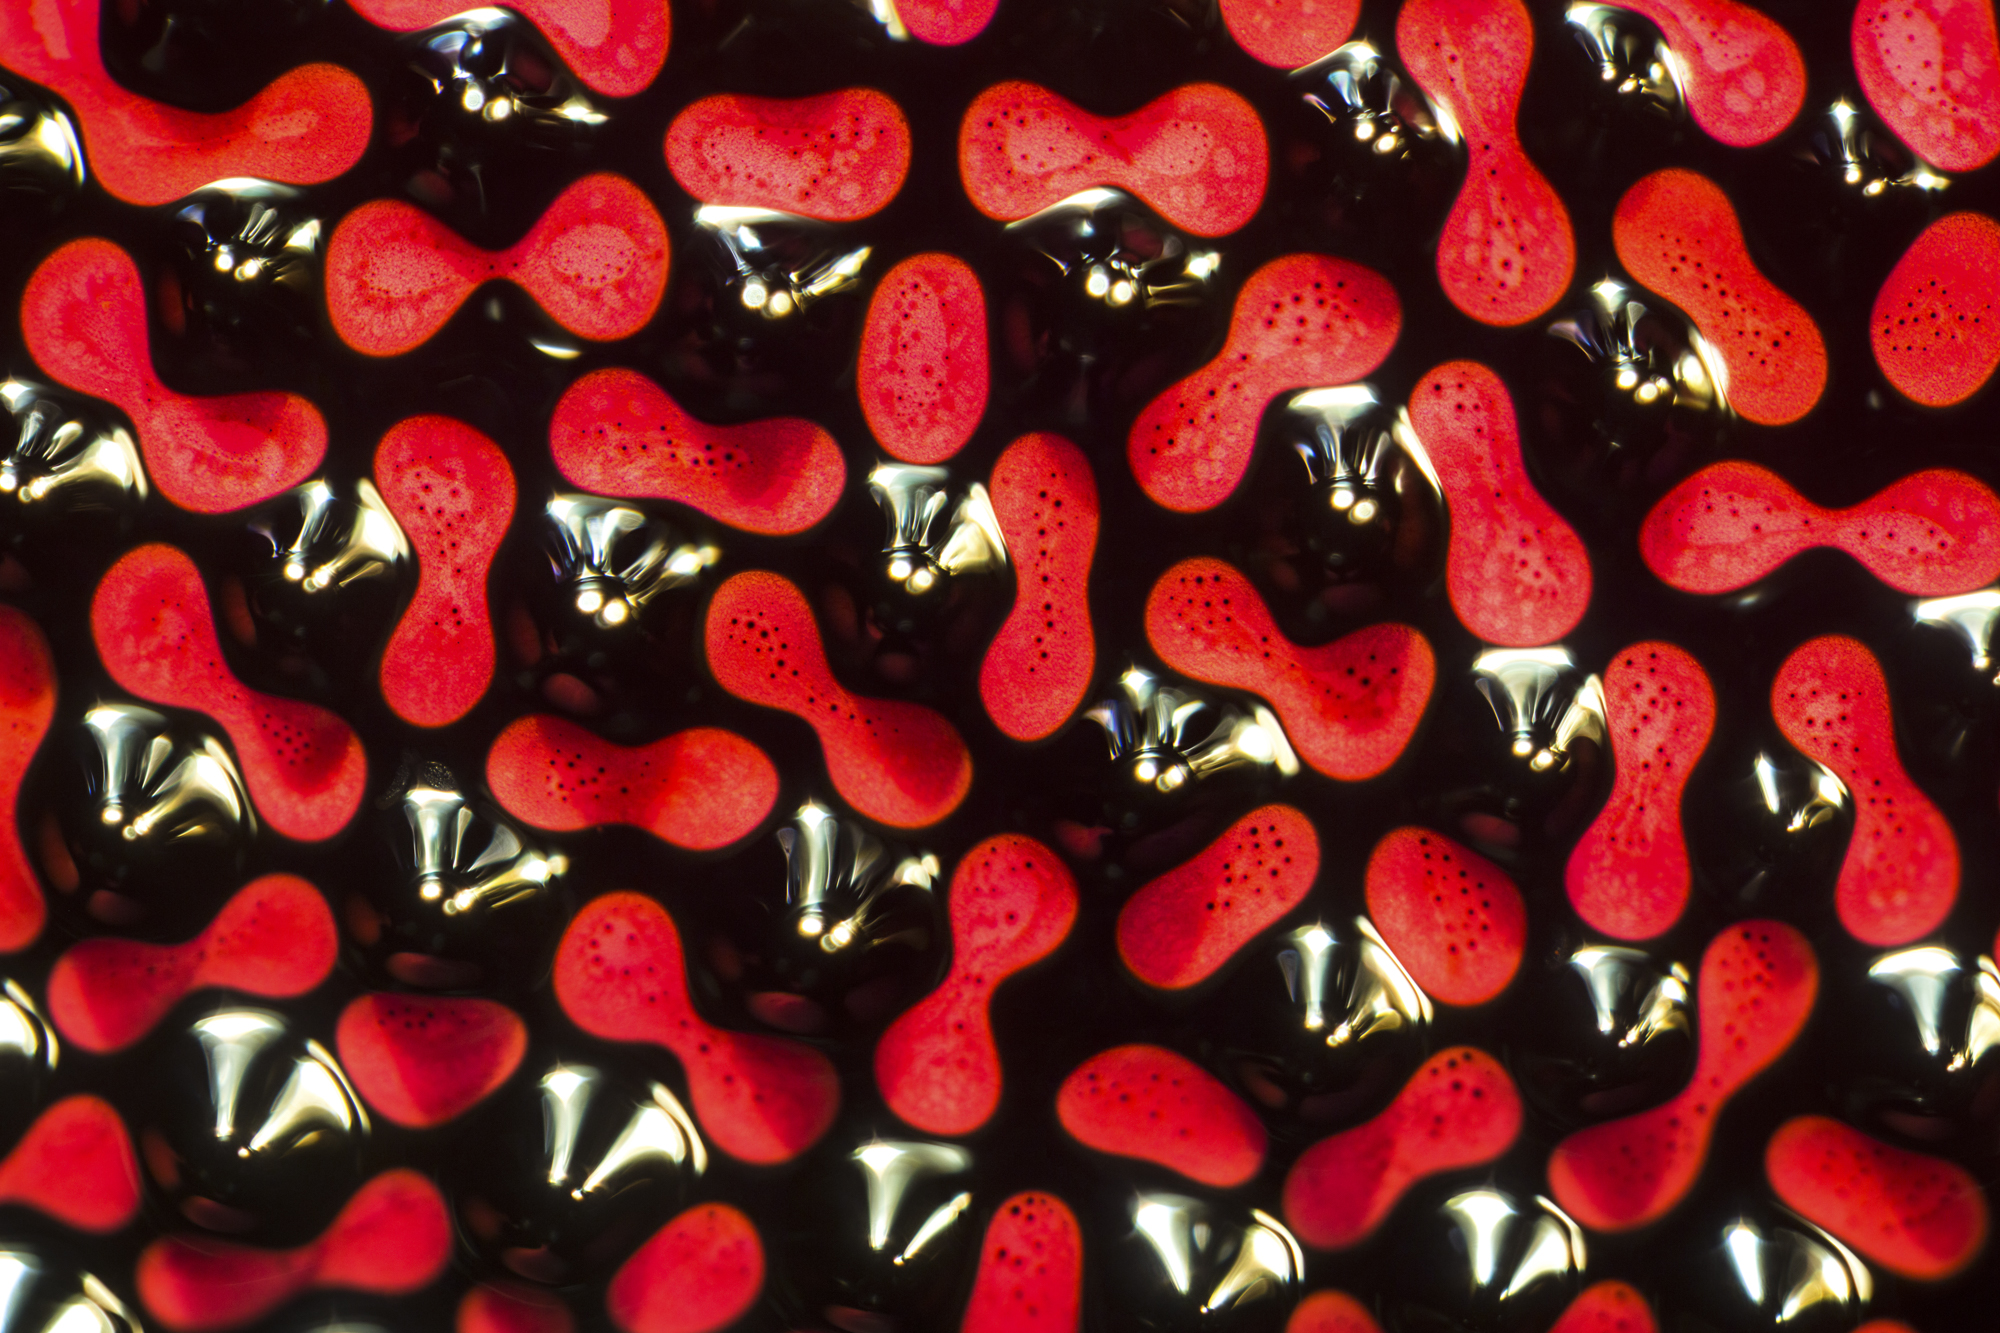 Ferrofluid 9